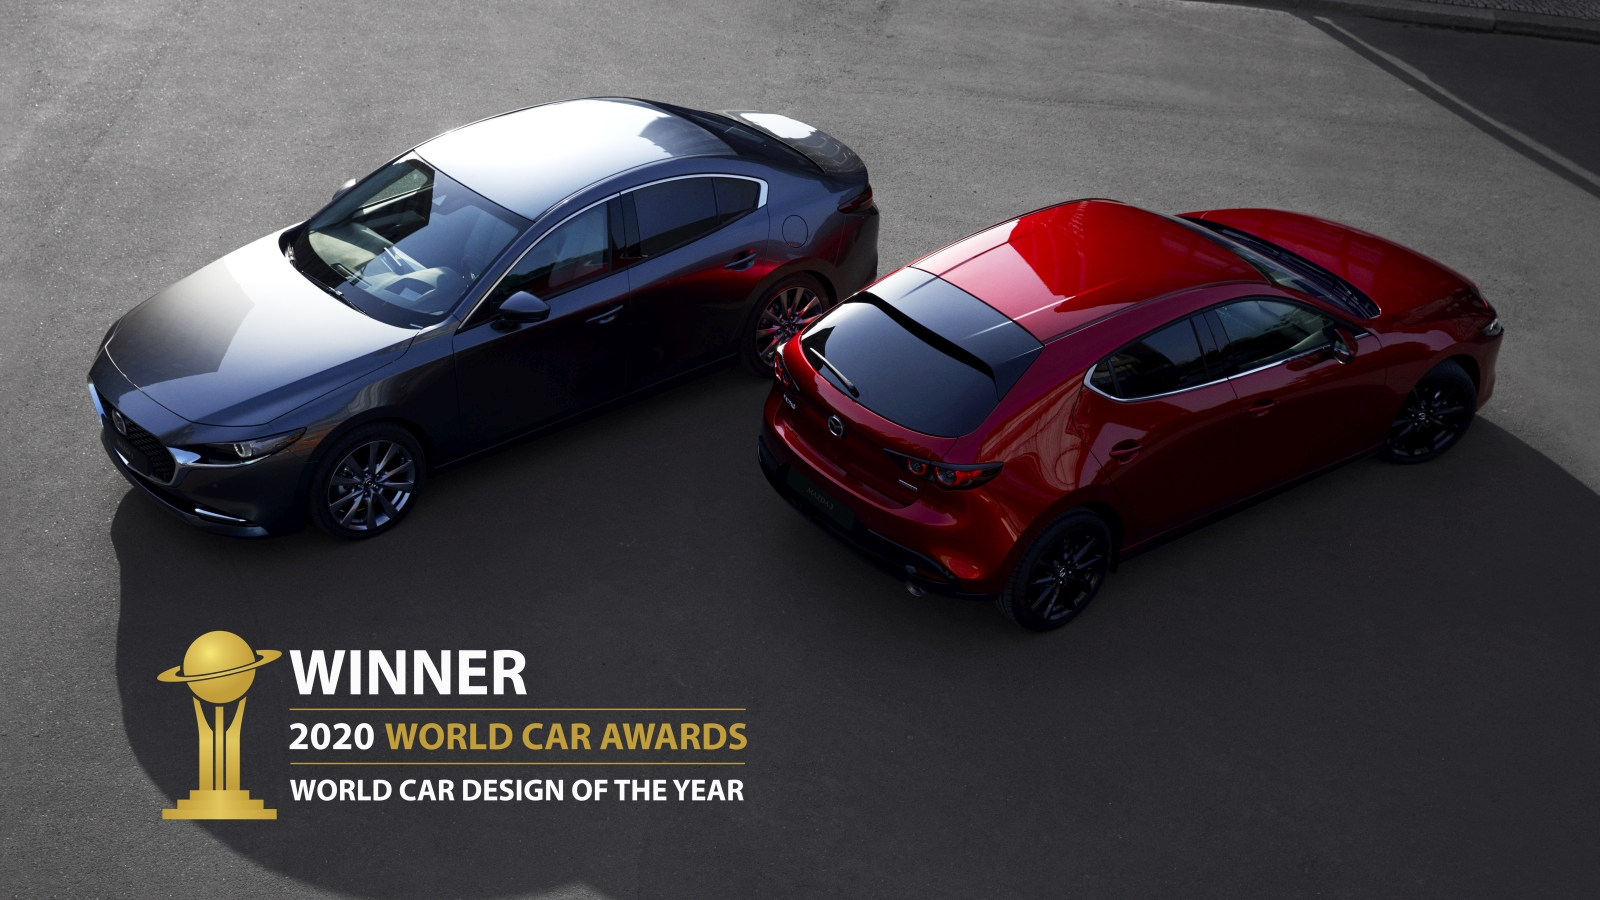 Teaser_Mazda3_2020-World-Car-Design-of-the-Year_large